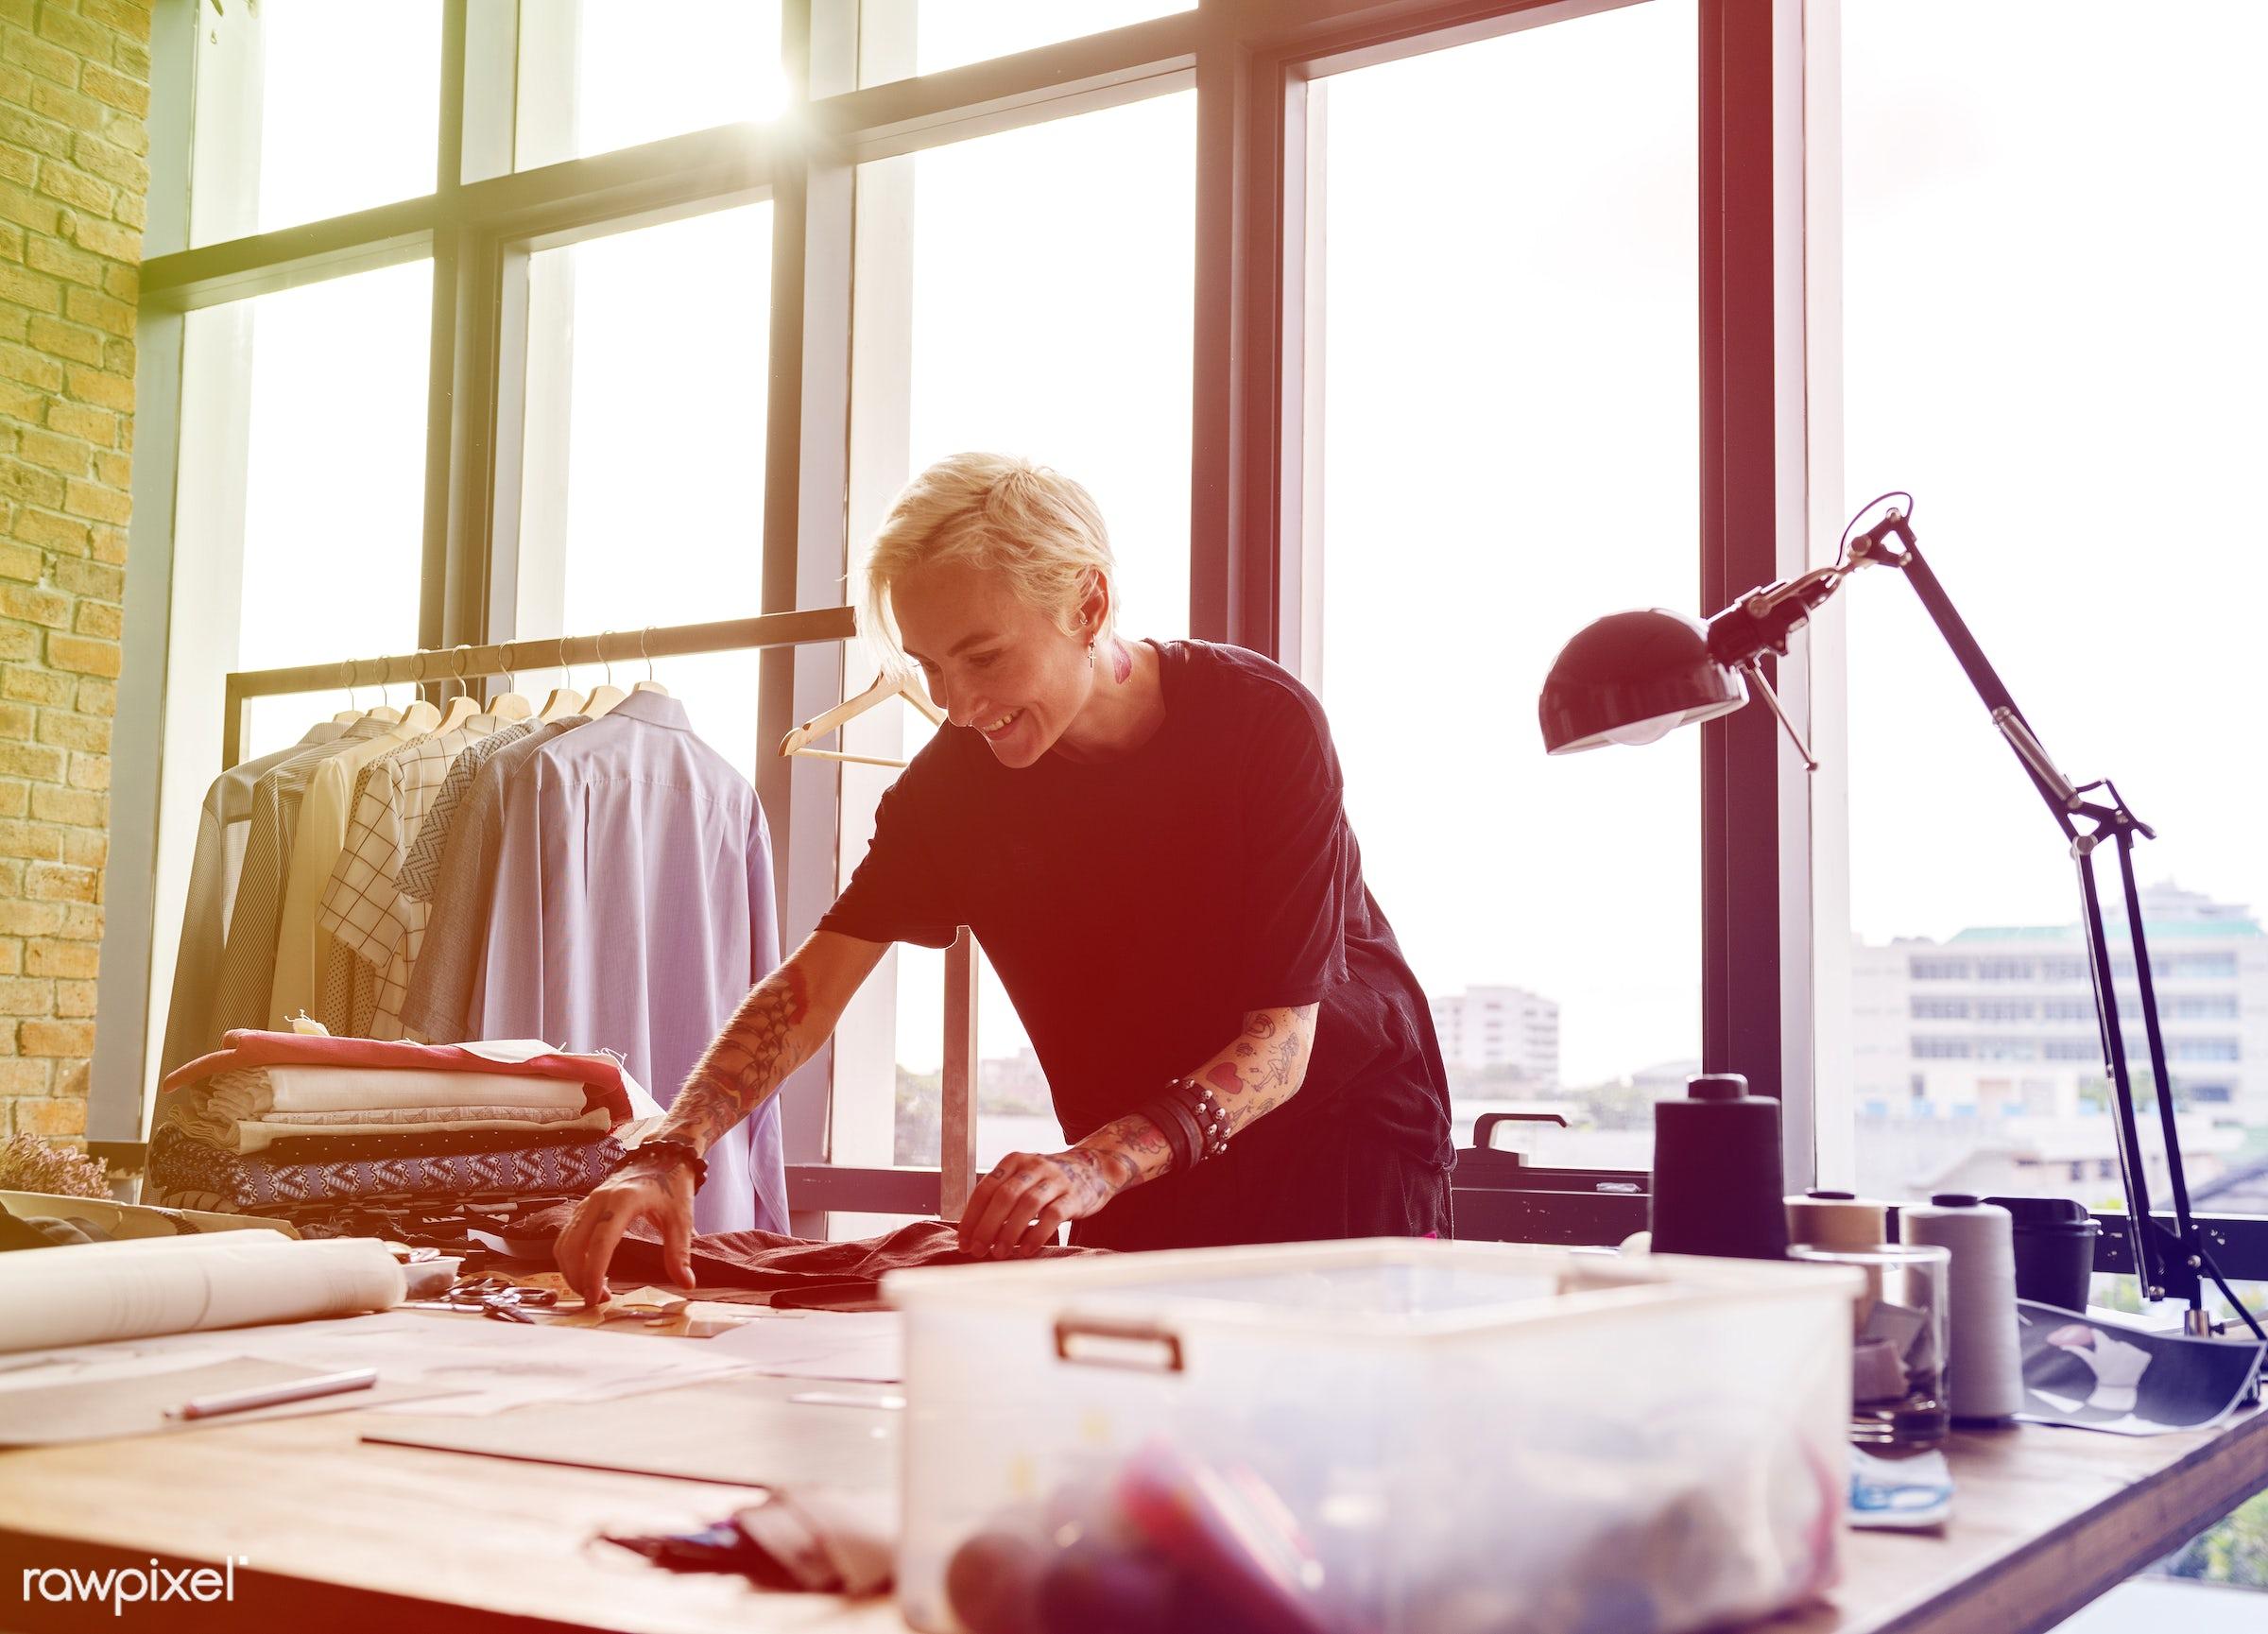 designing, dressmaker, faded, yellow, vibrant, selecting, inspiration, materials, threads, choosing, choosing materials,...